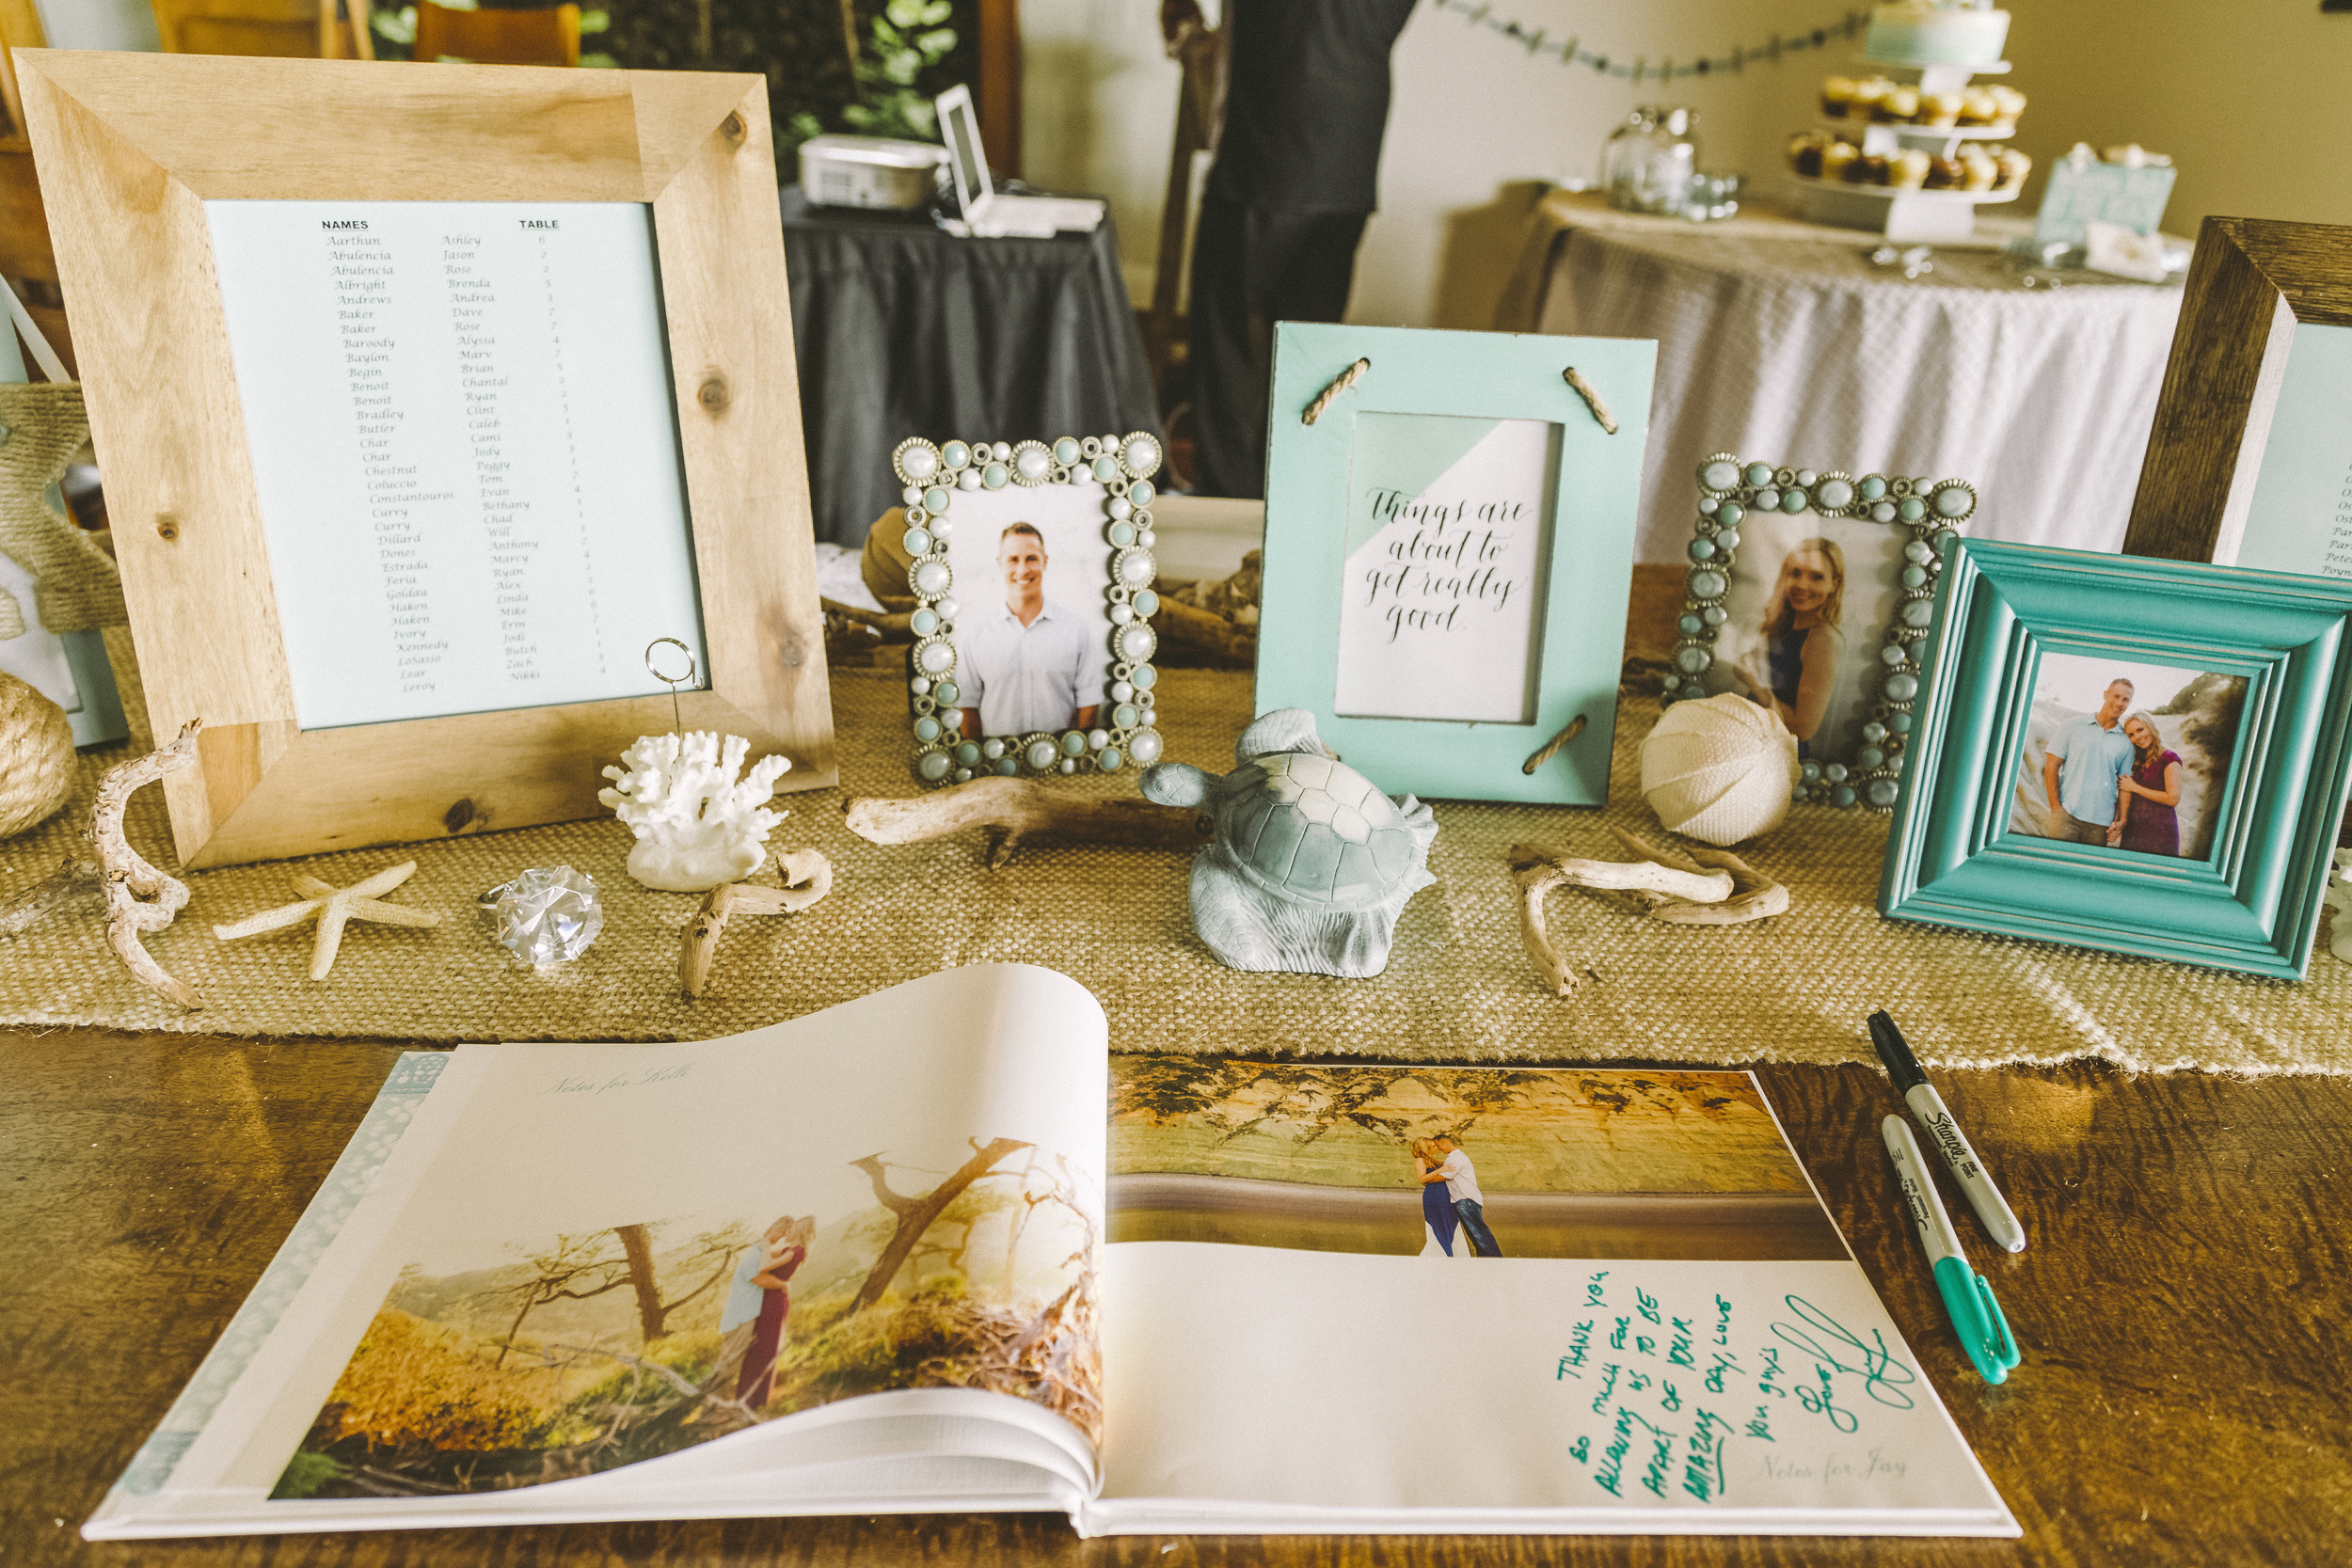 angie-diaz-photography-hawaii-wedding-photographer-kelli-jay-98.jpg